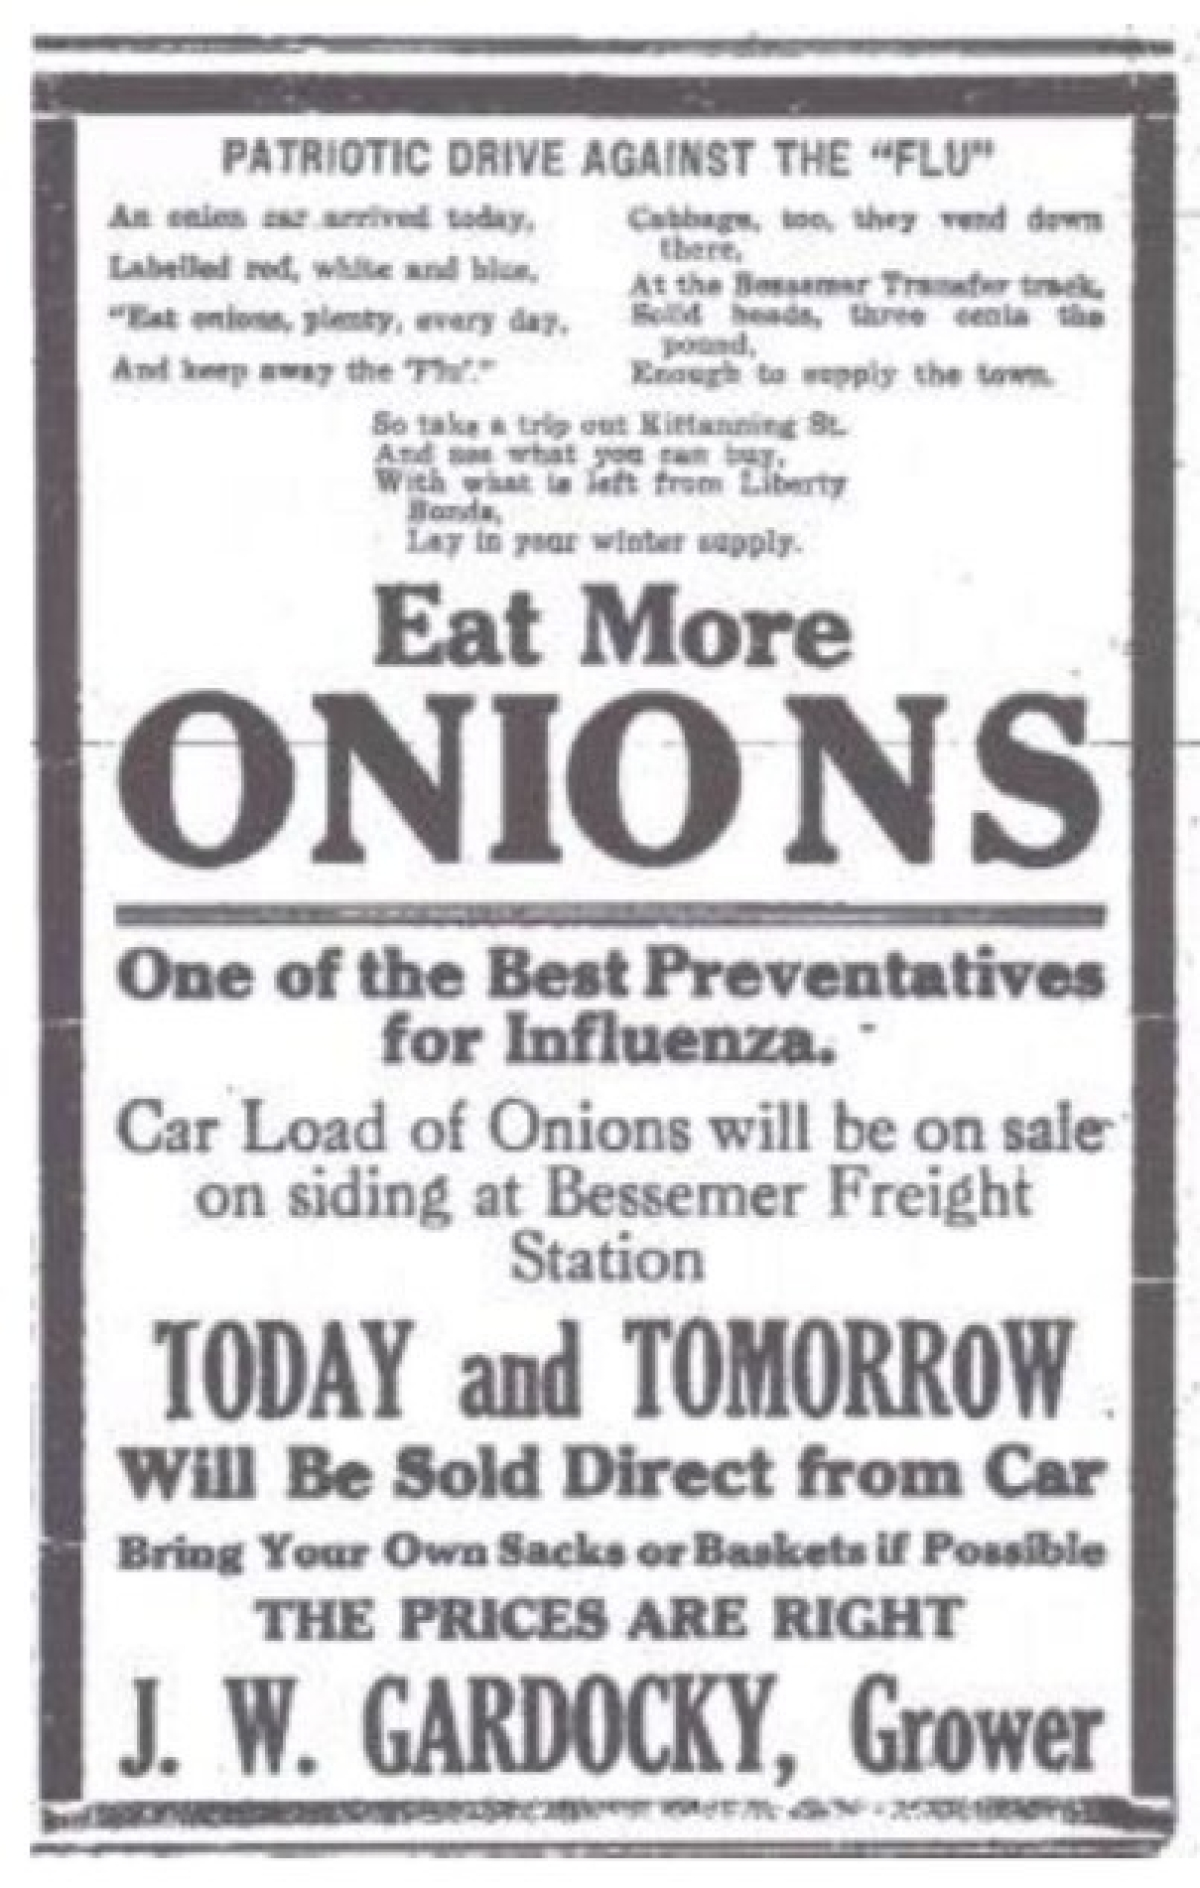 An ad for an onion sale